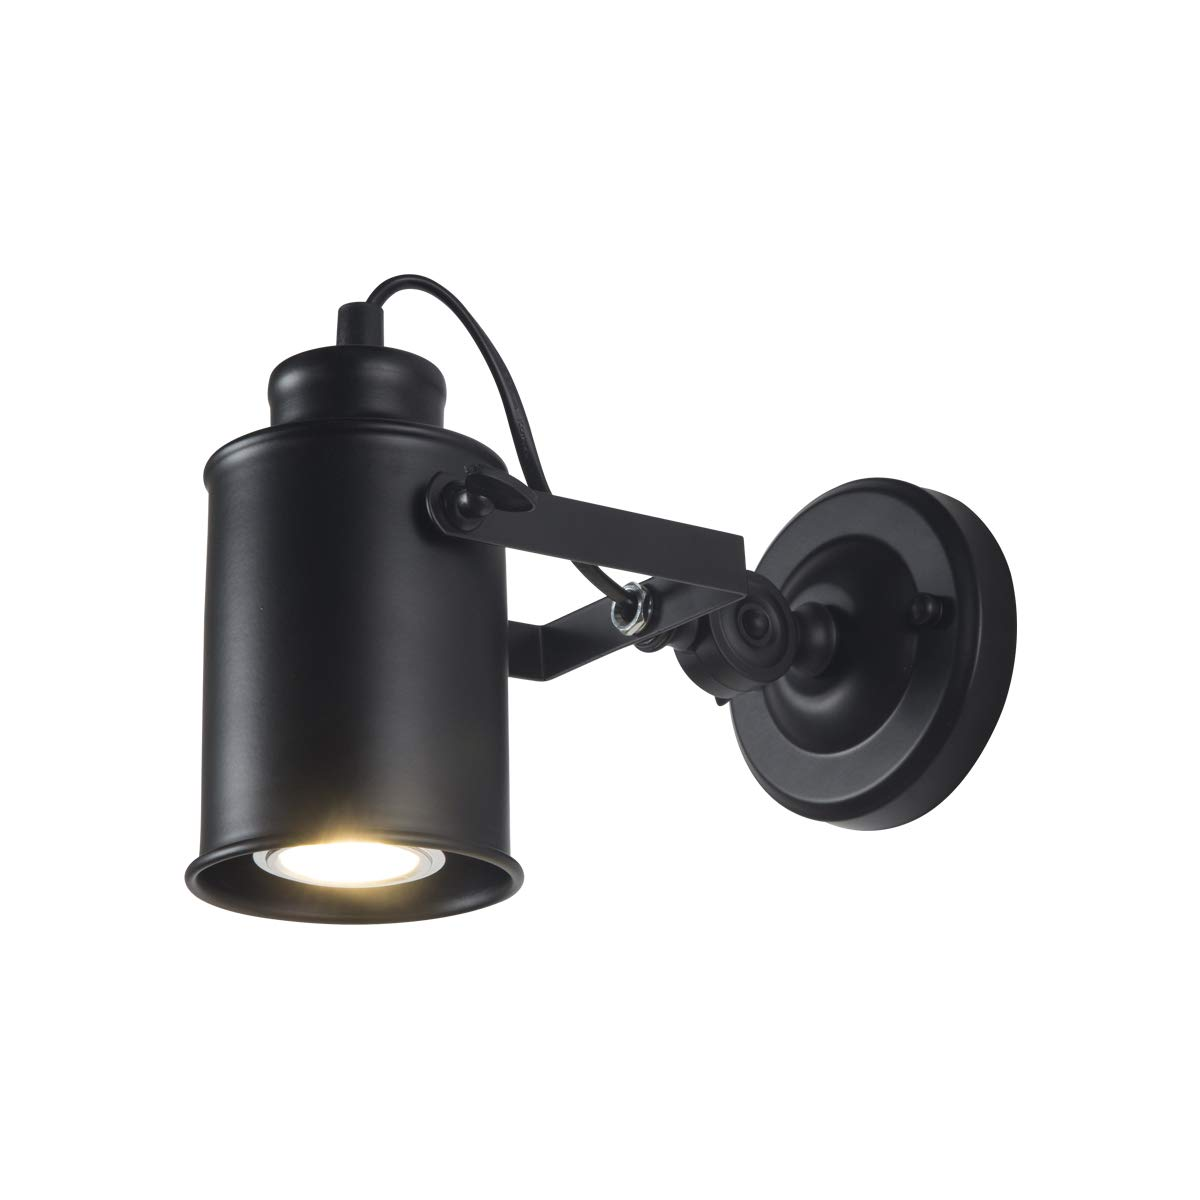 JINYU Vintage Industrial Loft Rustic Adjustable Wall Sconce Light//Wall Lamp Lights//LED Ceiling Flush Mount Lamps//Modern Spot Lighting//Night Spotlight,Black Color Metal Iron Lampshade//Spotting E27